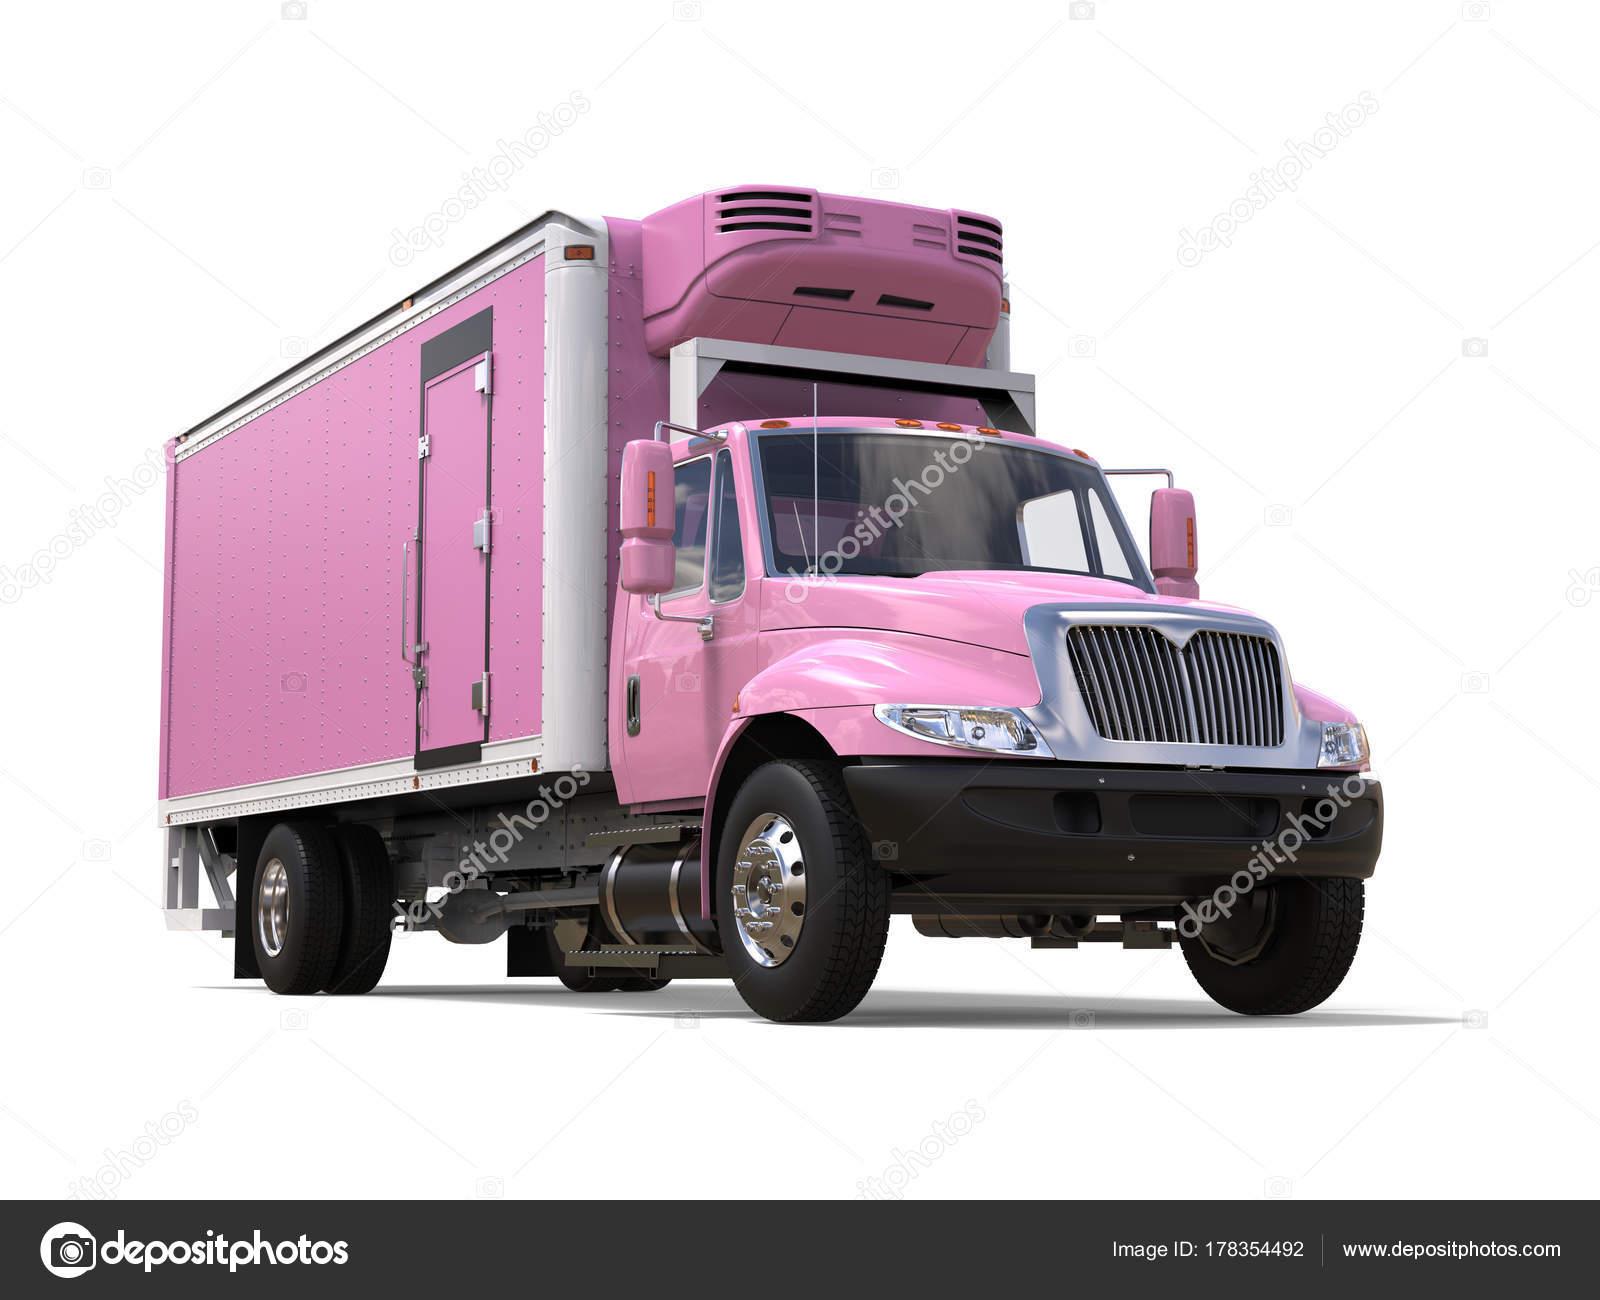 Amerikanischer Kühlschrank Pink : Rosa kühlschrank lkw ladung closeup erschossen u stockfoto